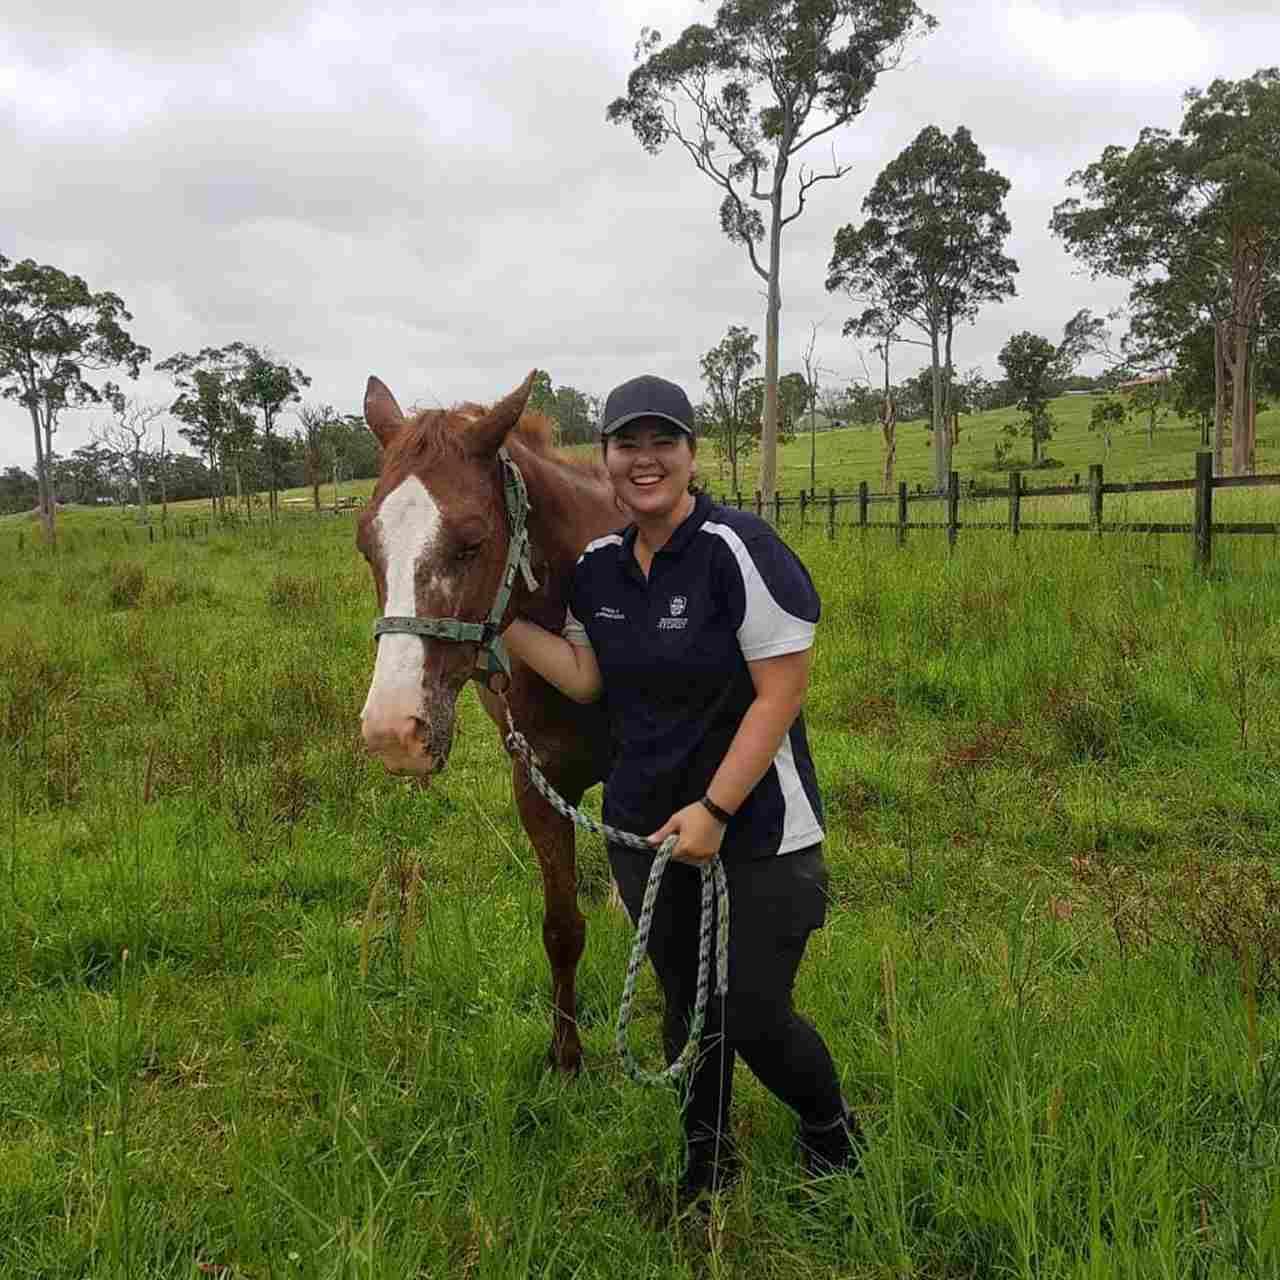 Isabel Padilla is taking up the Doctor of Veterinary Medicine program at an Australian university